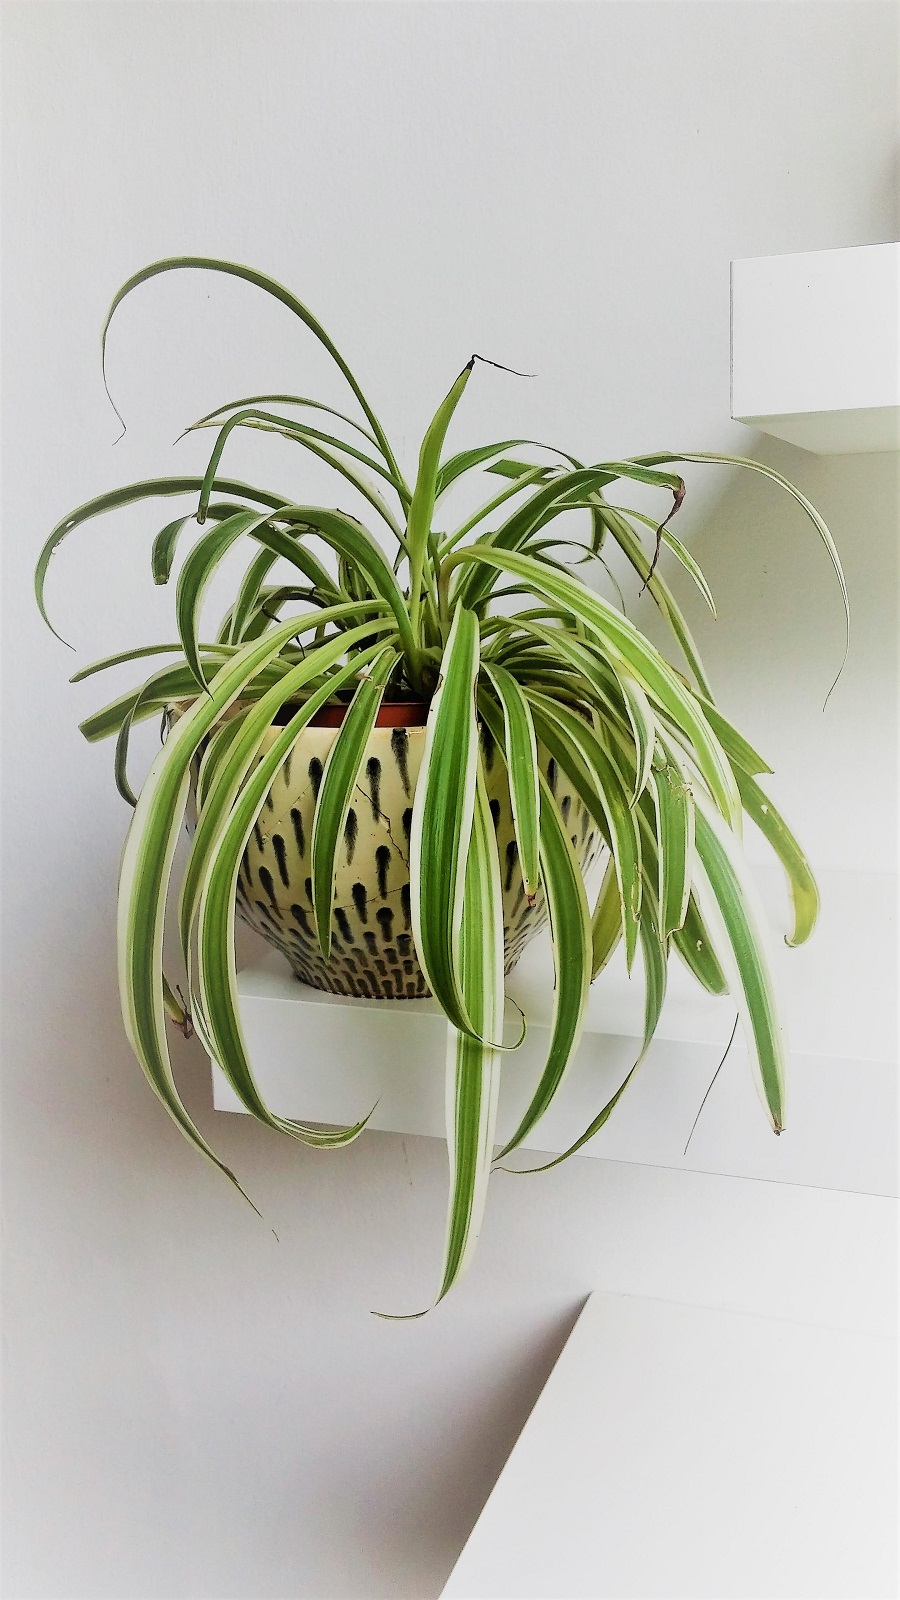 צמח העכביש